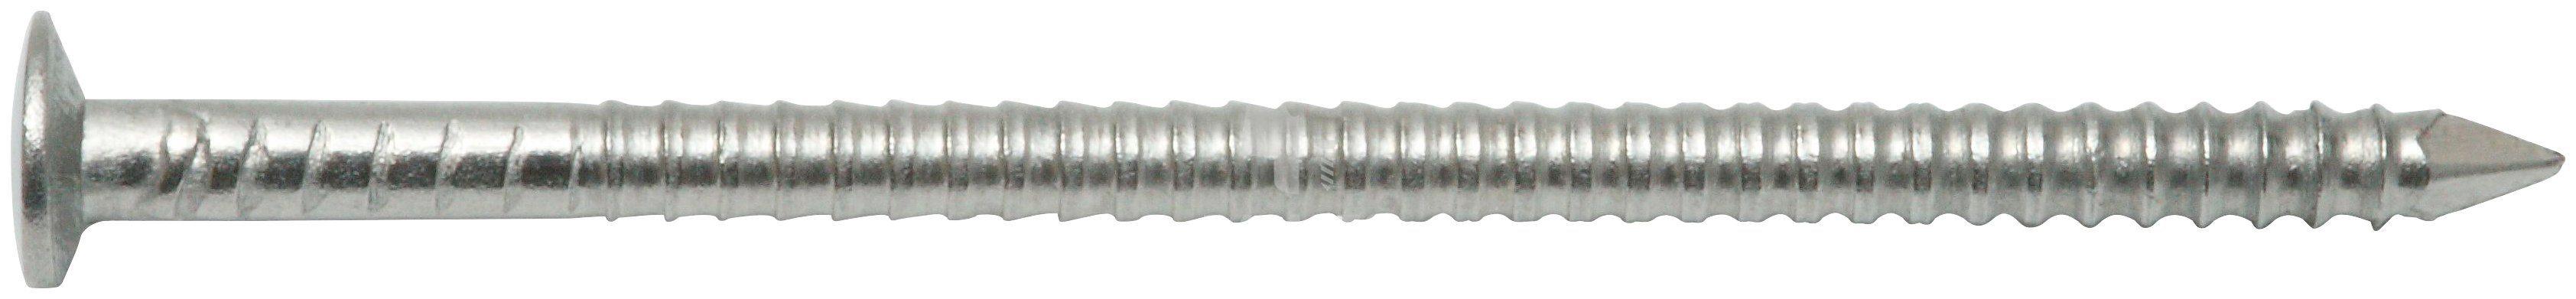 RAMSES Nagel , Linsenkopfnägel Senkkopf 2,3 x 60 mm Edelstahl A2, 200 Stk.